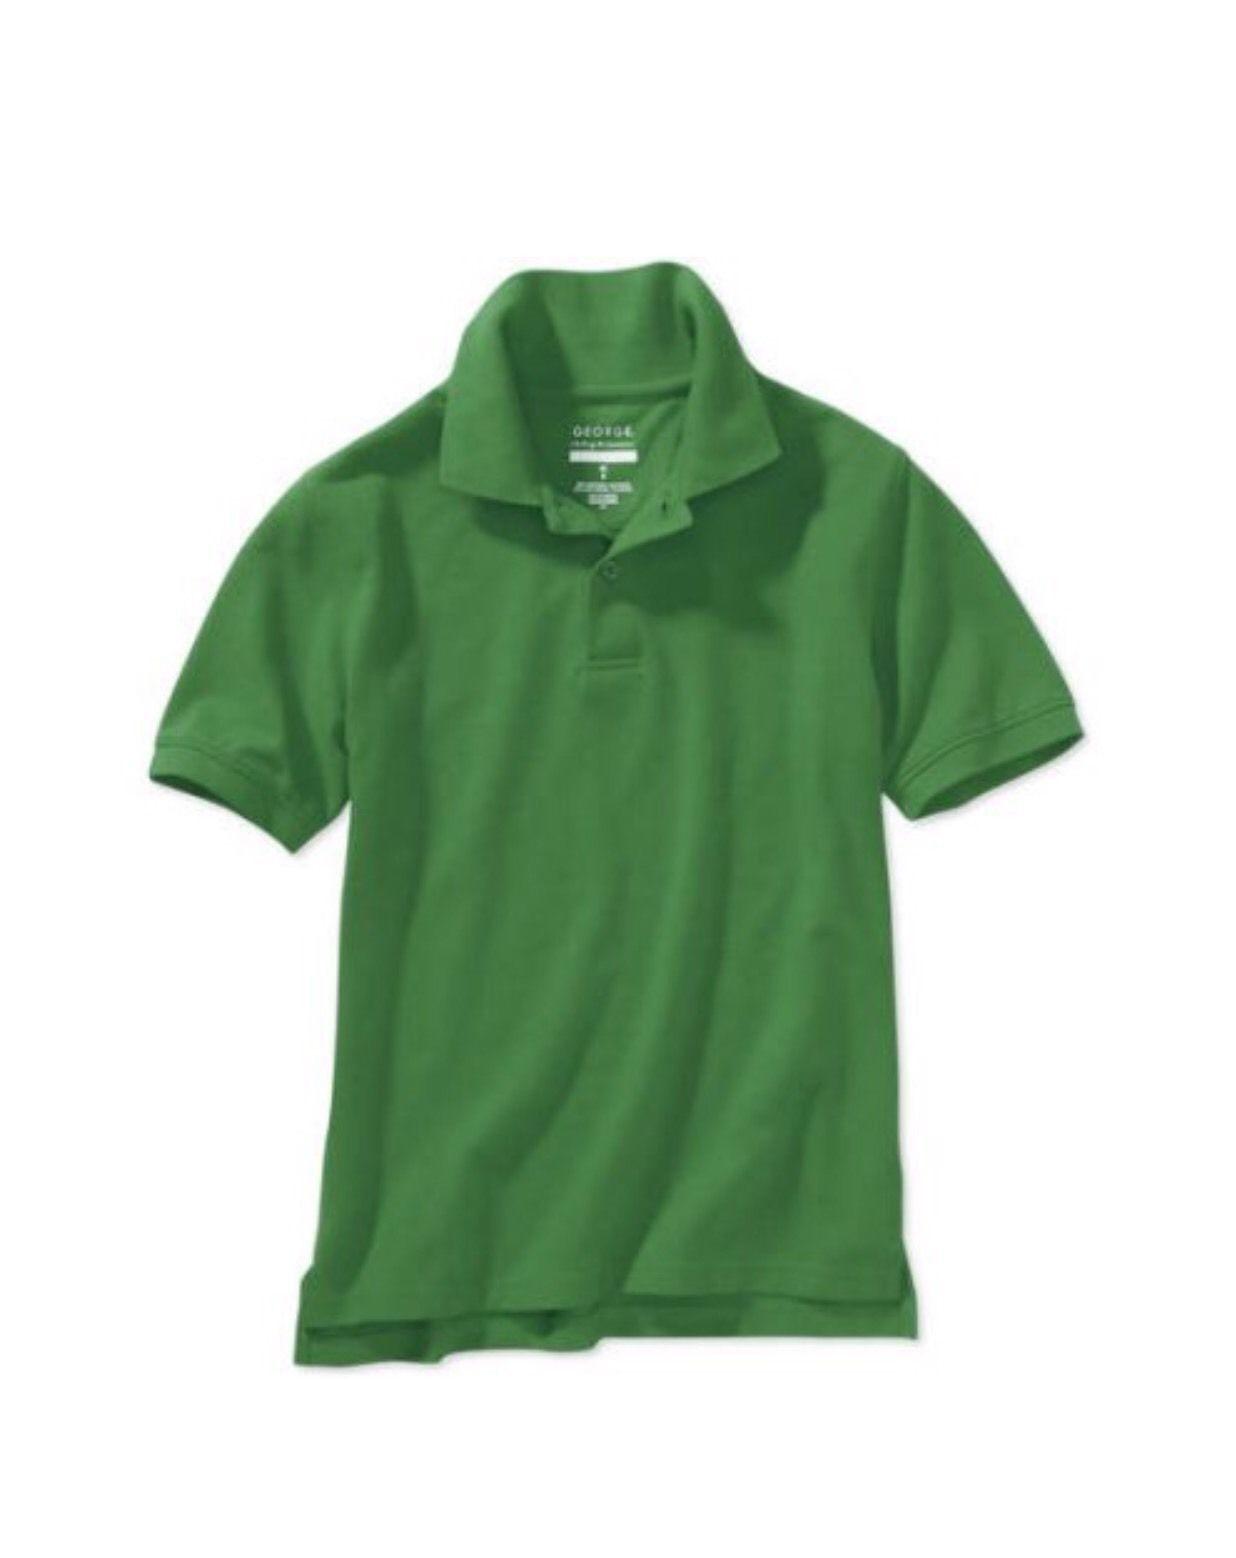 3193a7edcd George Girls School Uniform Long Sleeve Polo Shirt